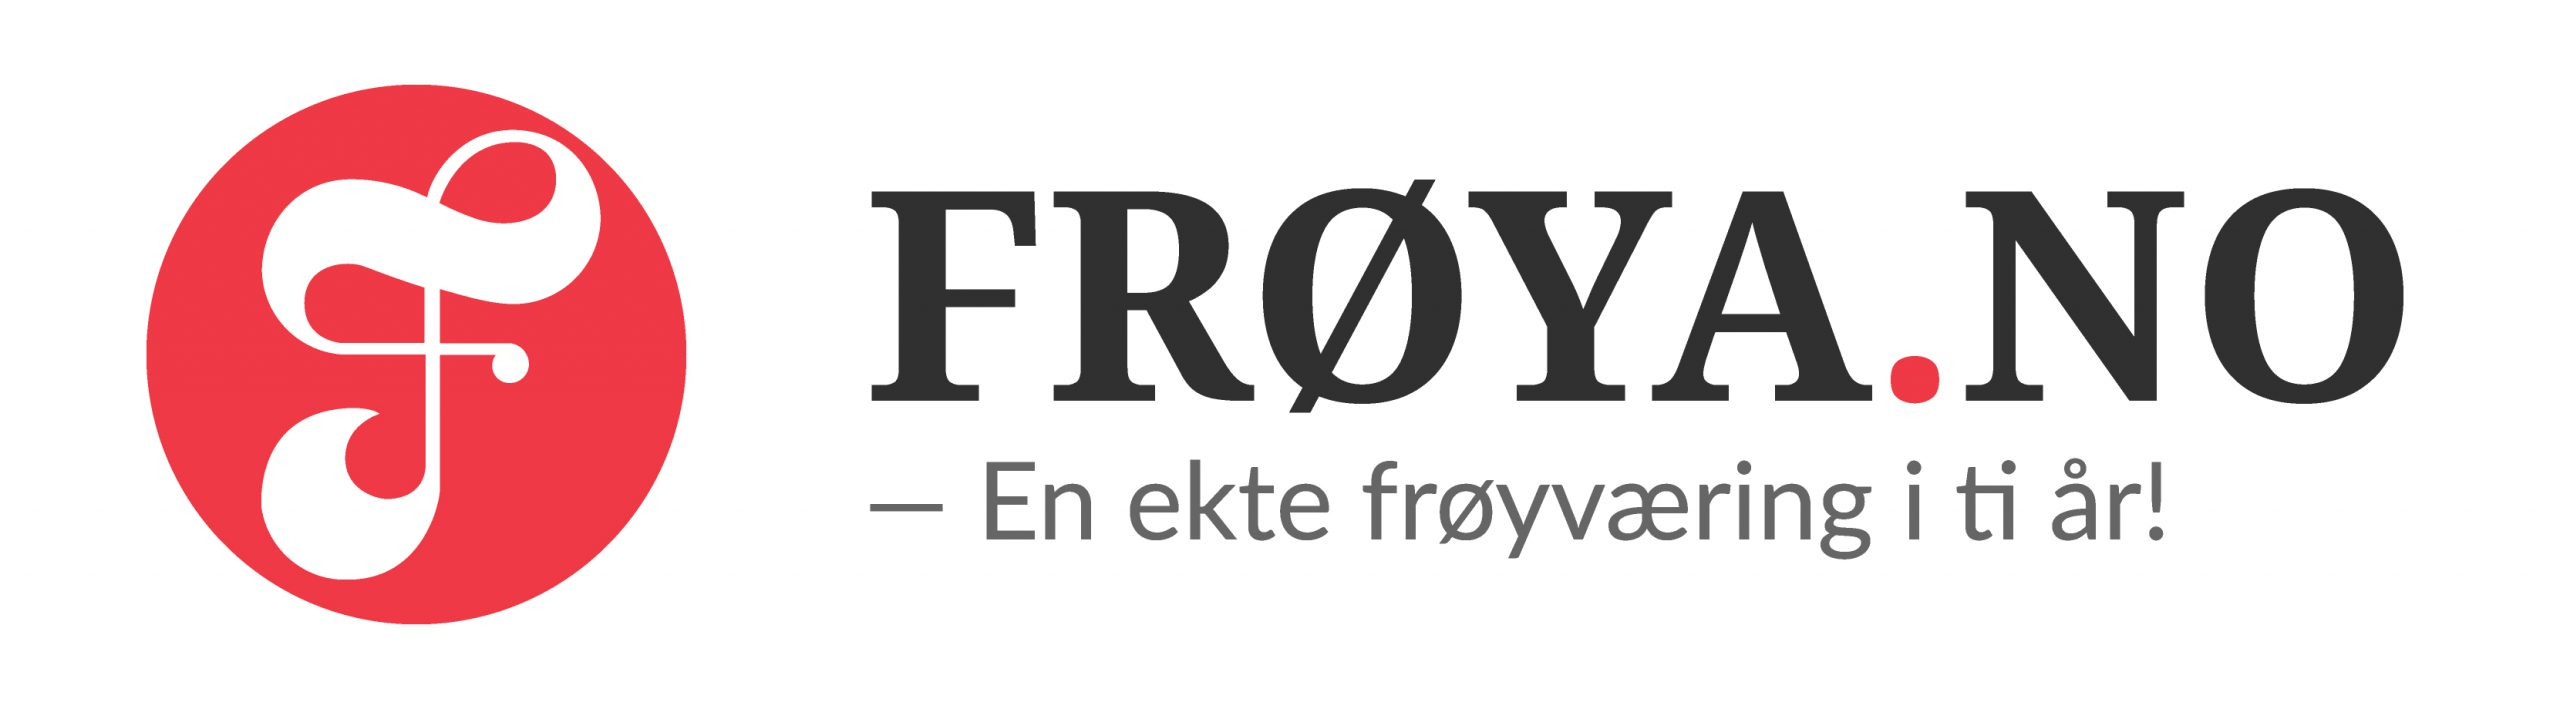 Frøya.no